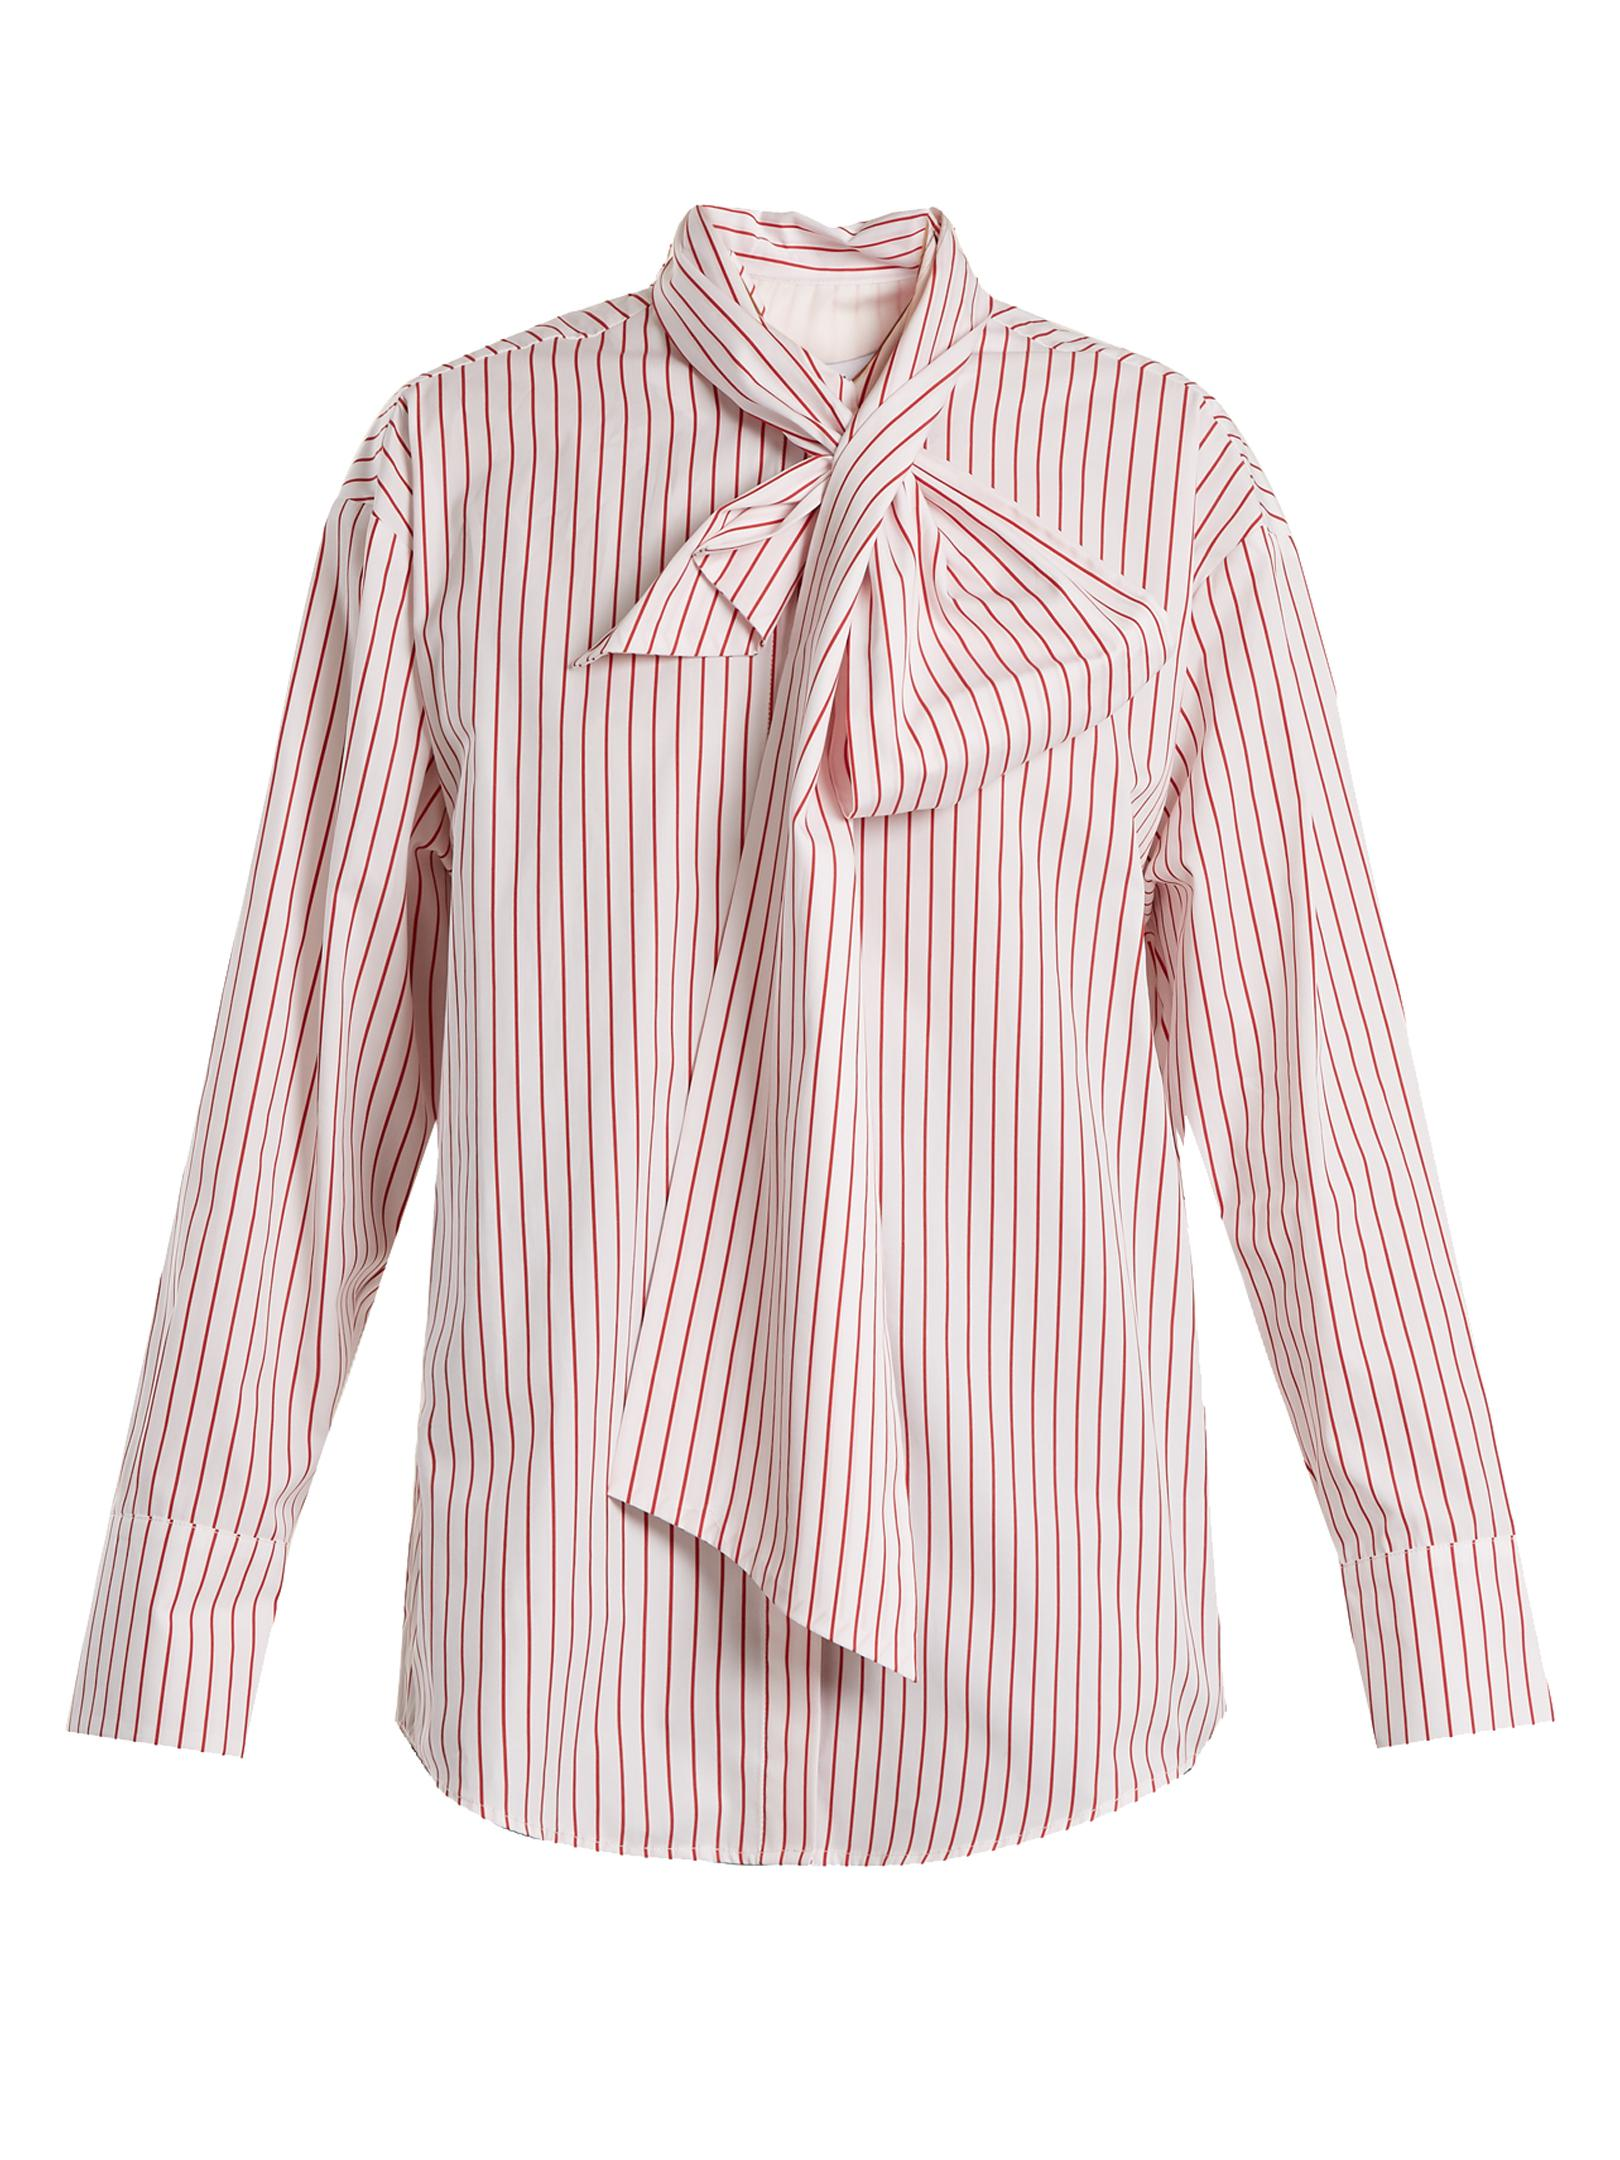 Lyst msgm striped tie neck cotton shirt in red for Striped tie with striped shirt